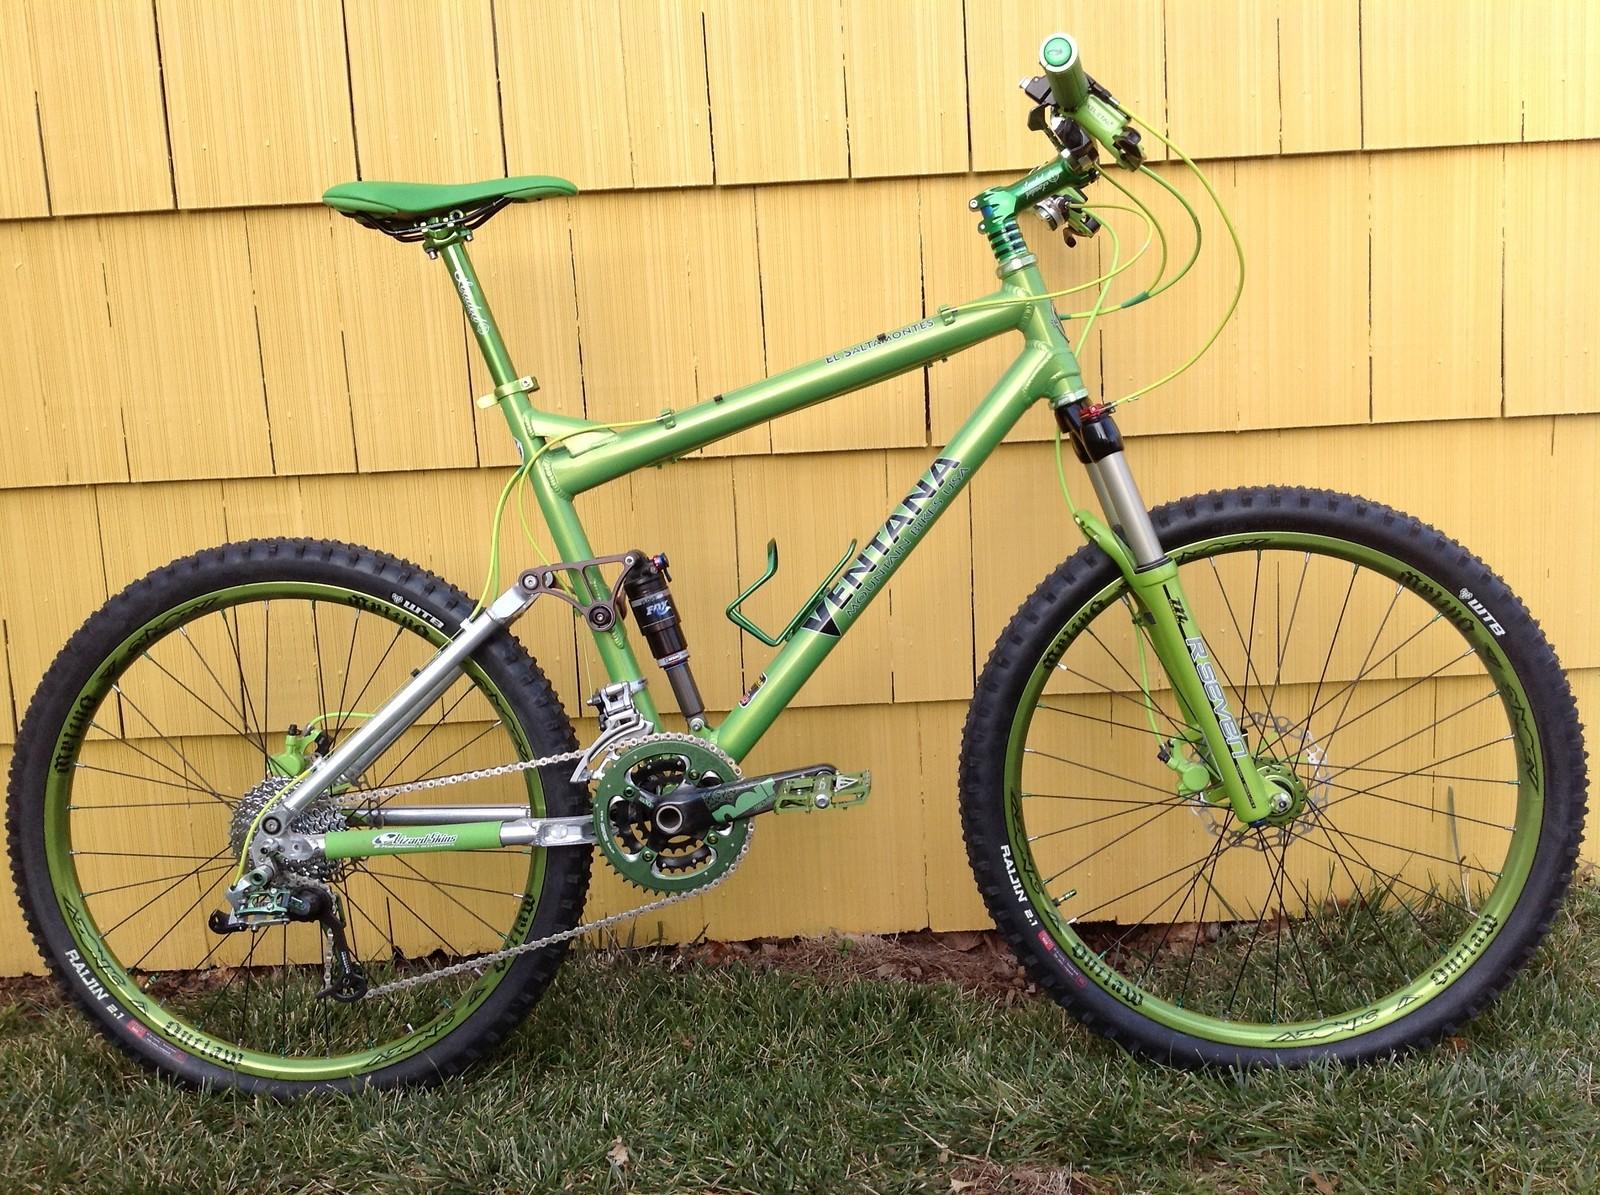 image - james.puskas.10 - Mountain Biking Pictures - Vital MTB